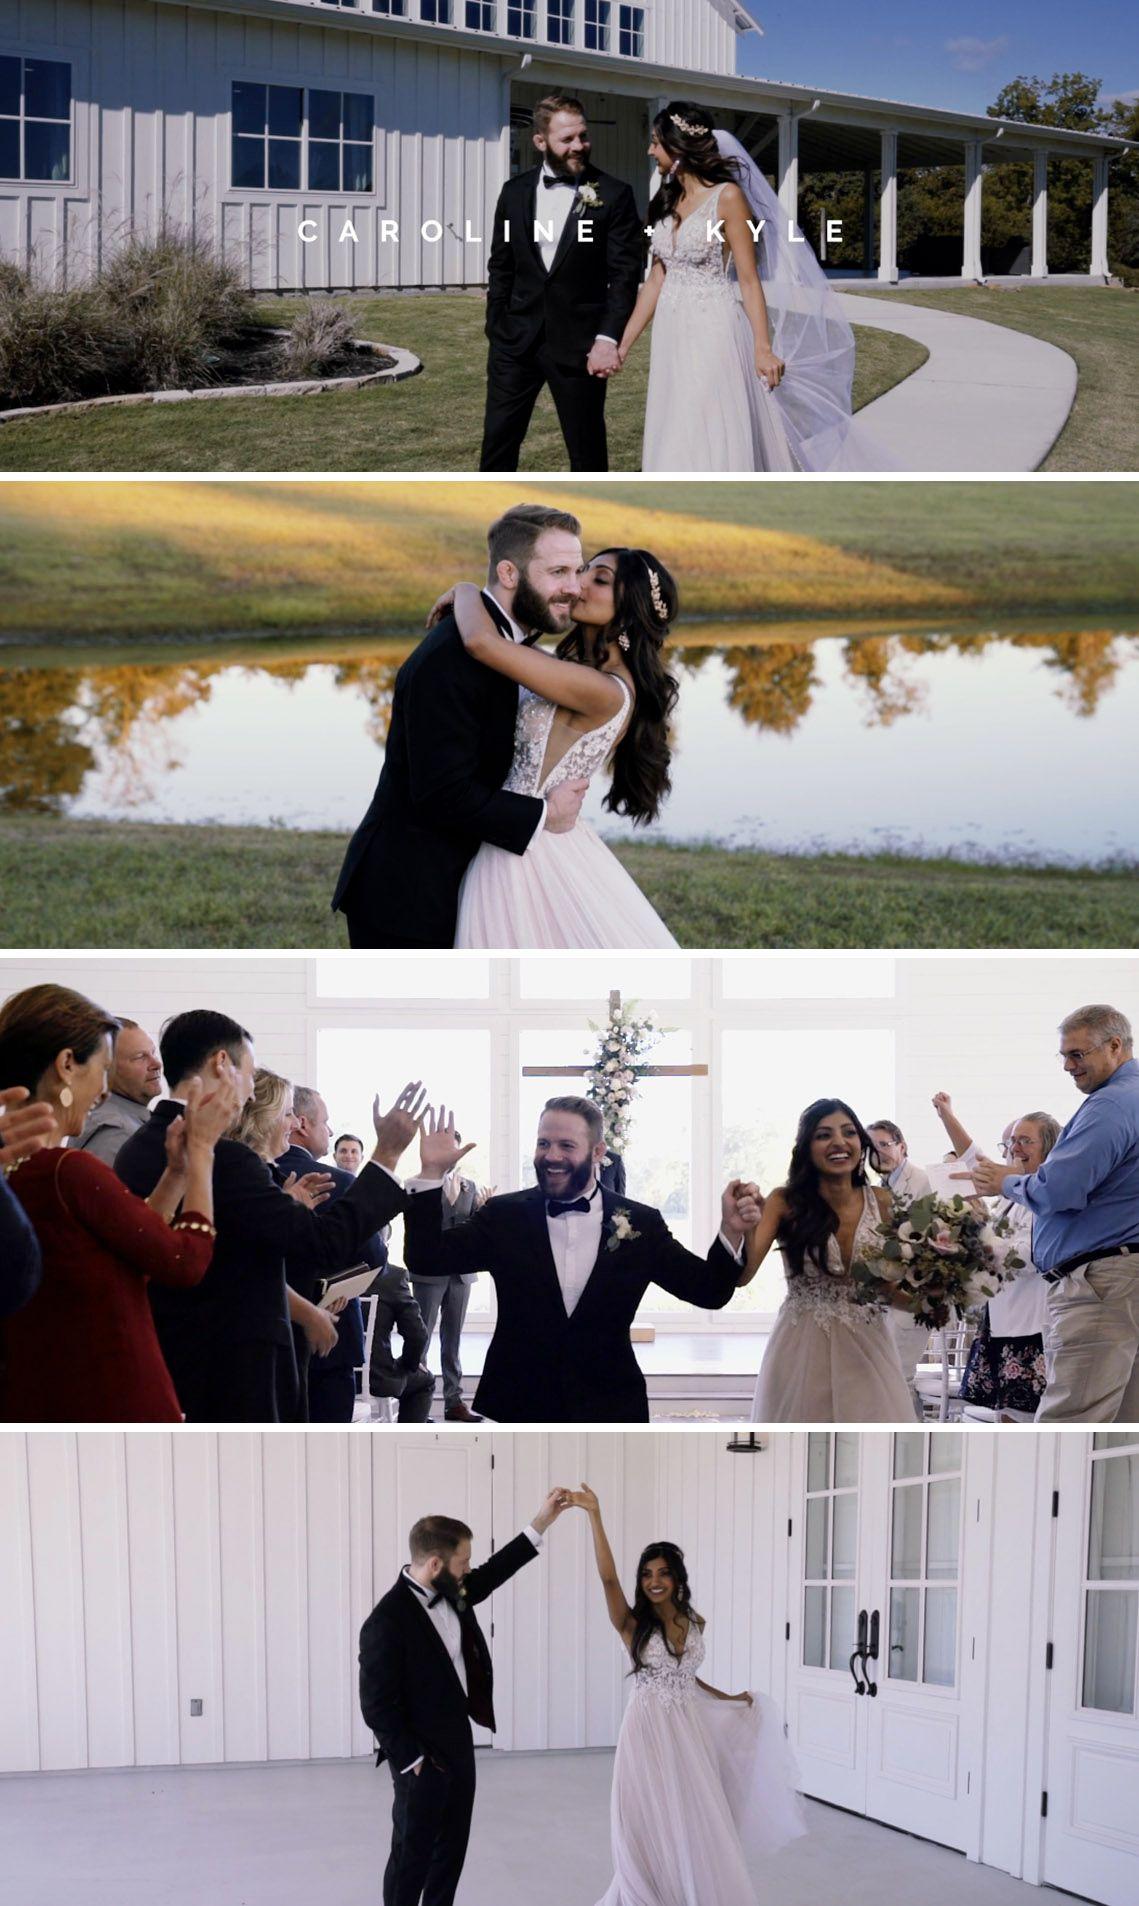 Award winning wedding videography with no regrets